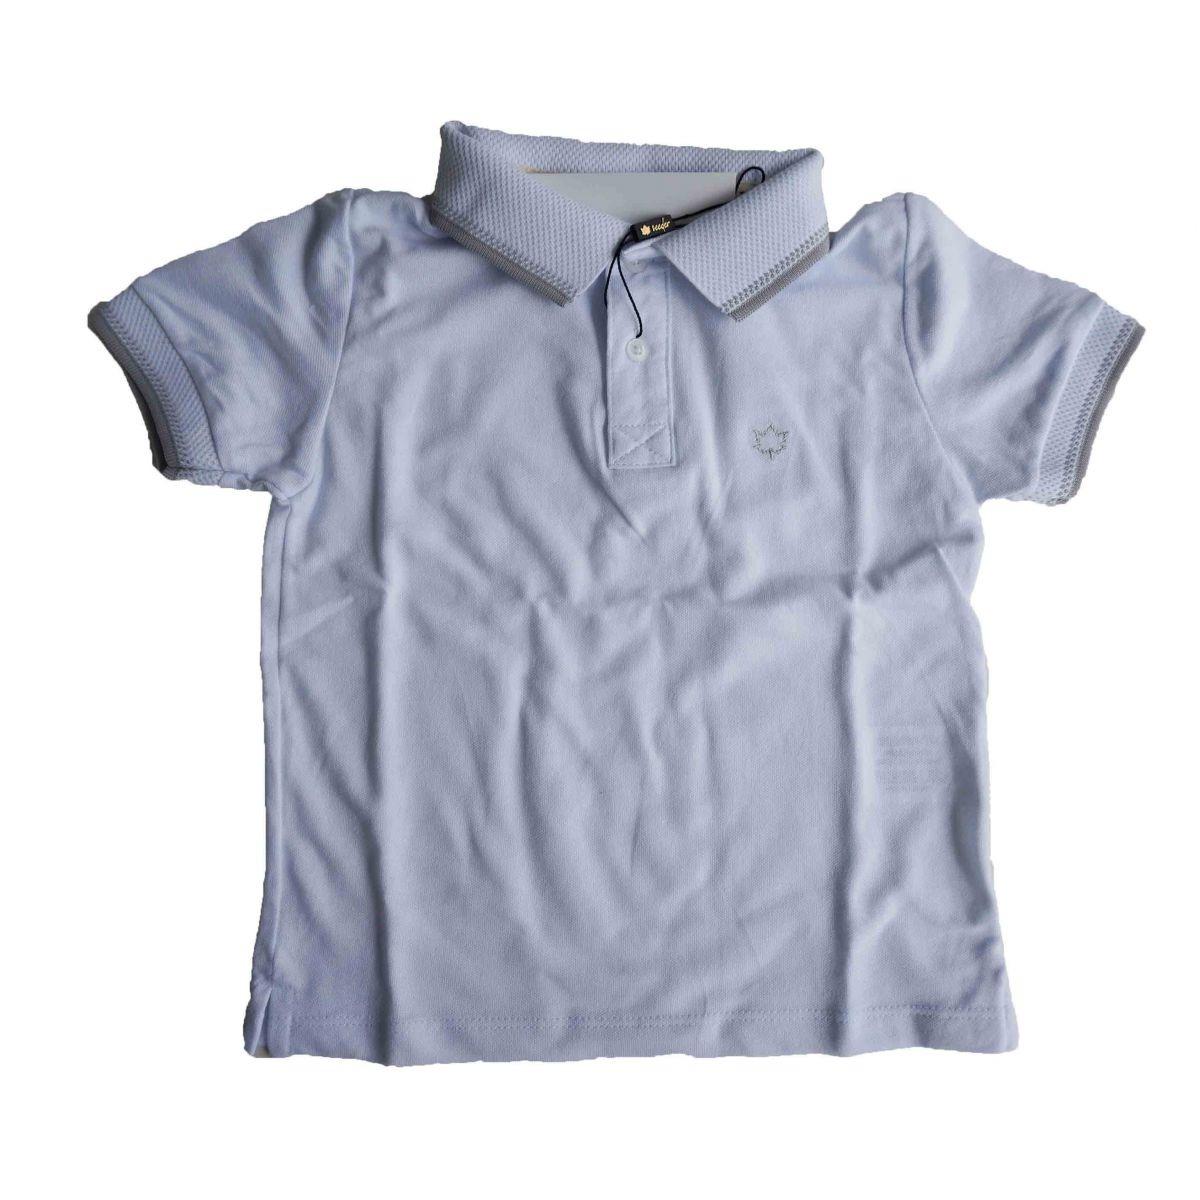 Camisa Polo Infantil Branca Manga Curta Meninos Seeder - R  58 0a3e379d42422